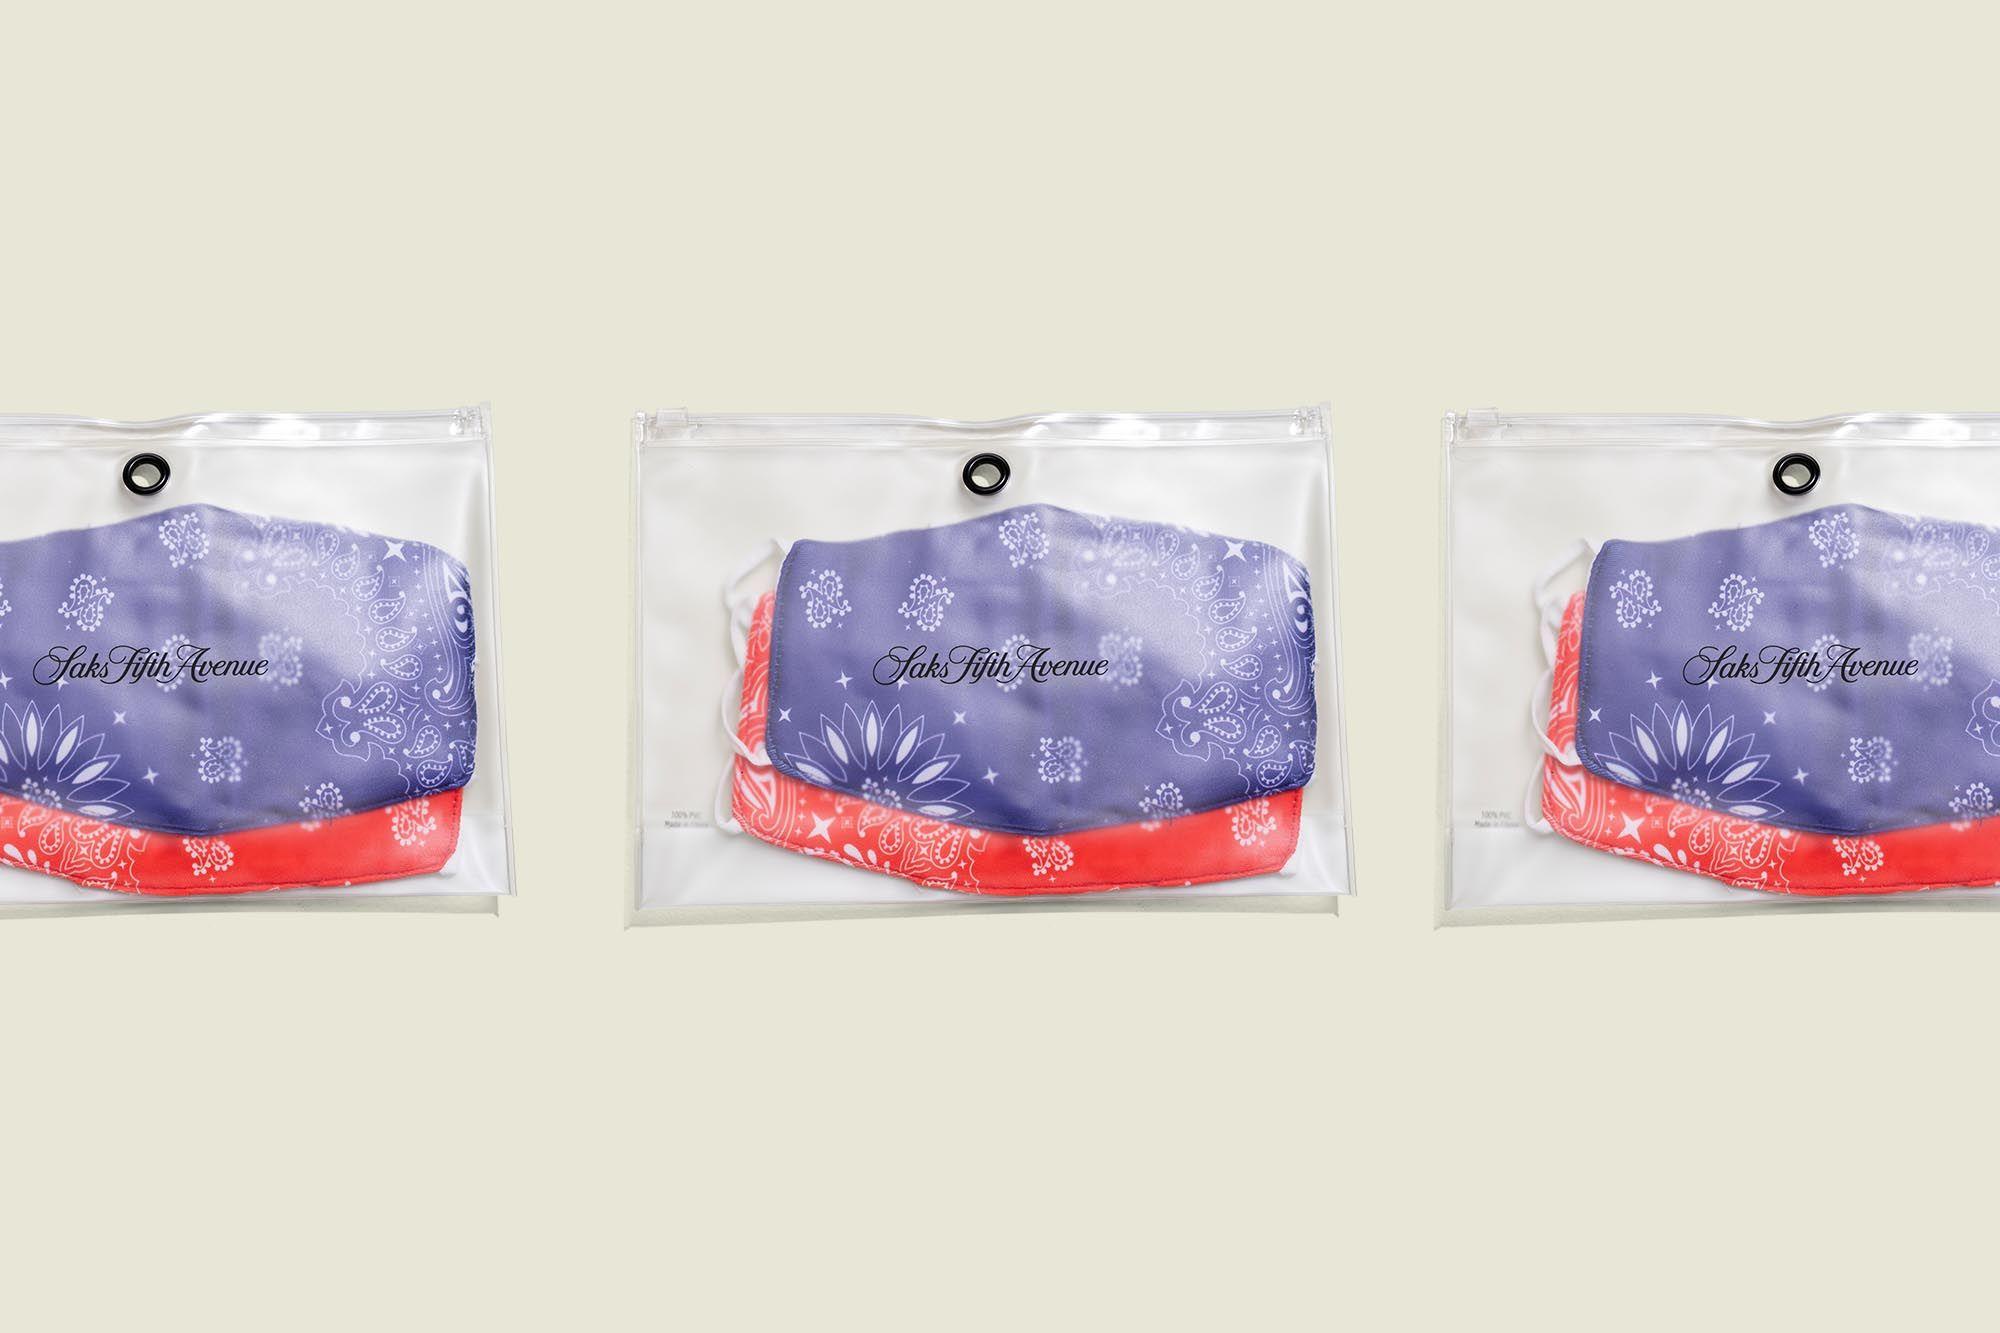 Face masks packaged in ziplock bags